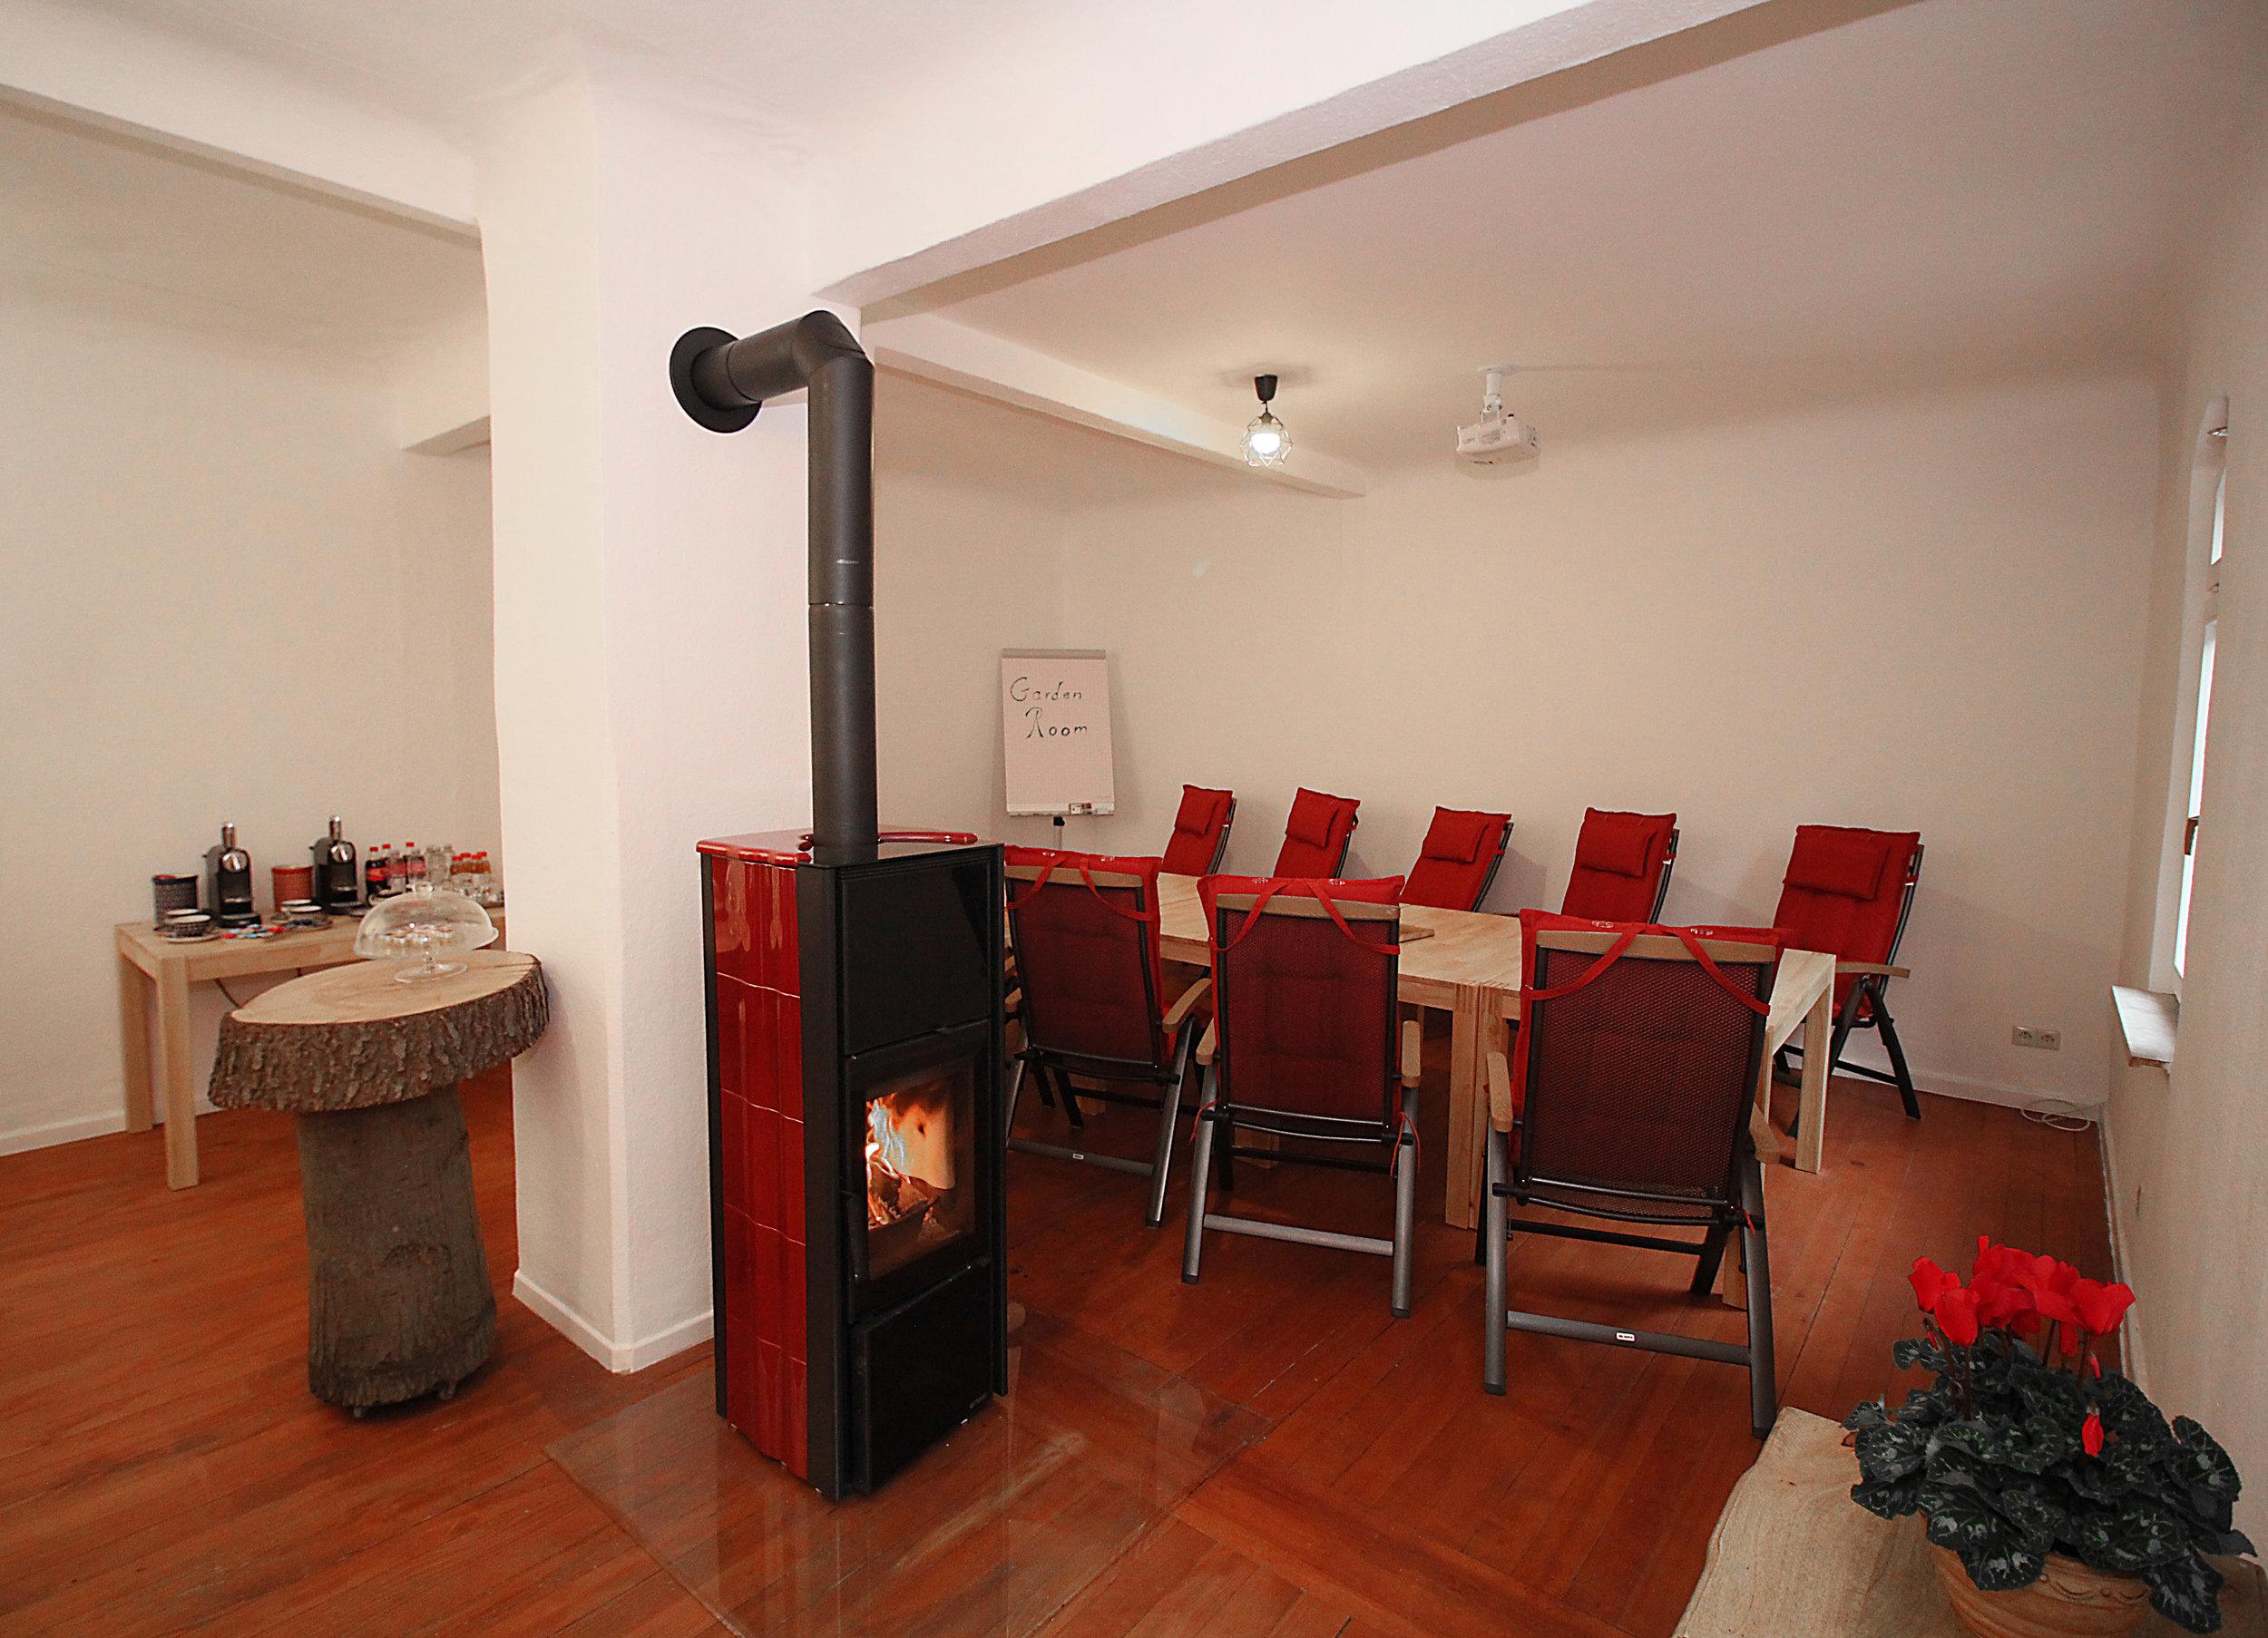 Garden Room - Raumgröße: 11 PersonenAusstattung: Beamer, Flipchart, Whiteboards, Internetzugang, Moderationskoffer